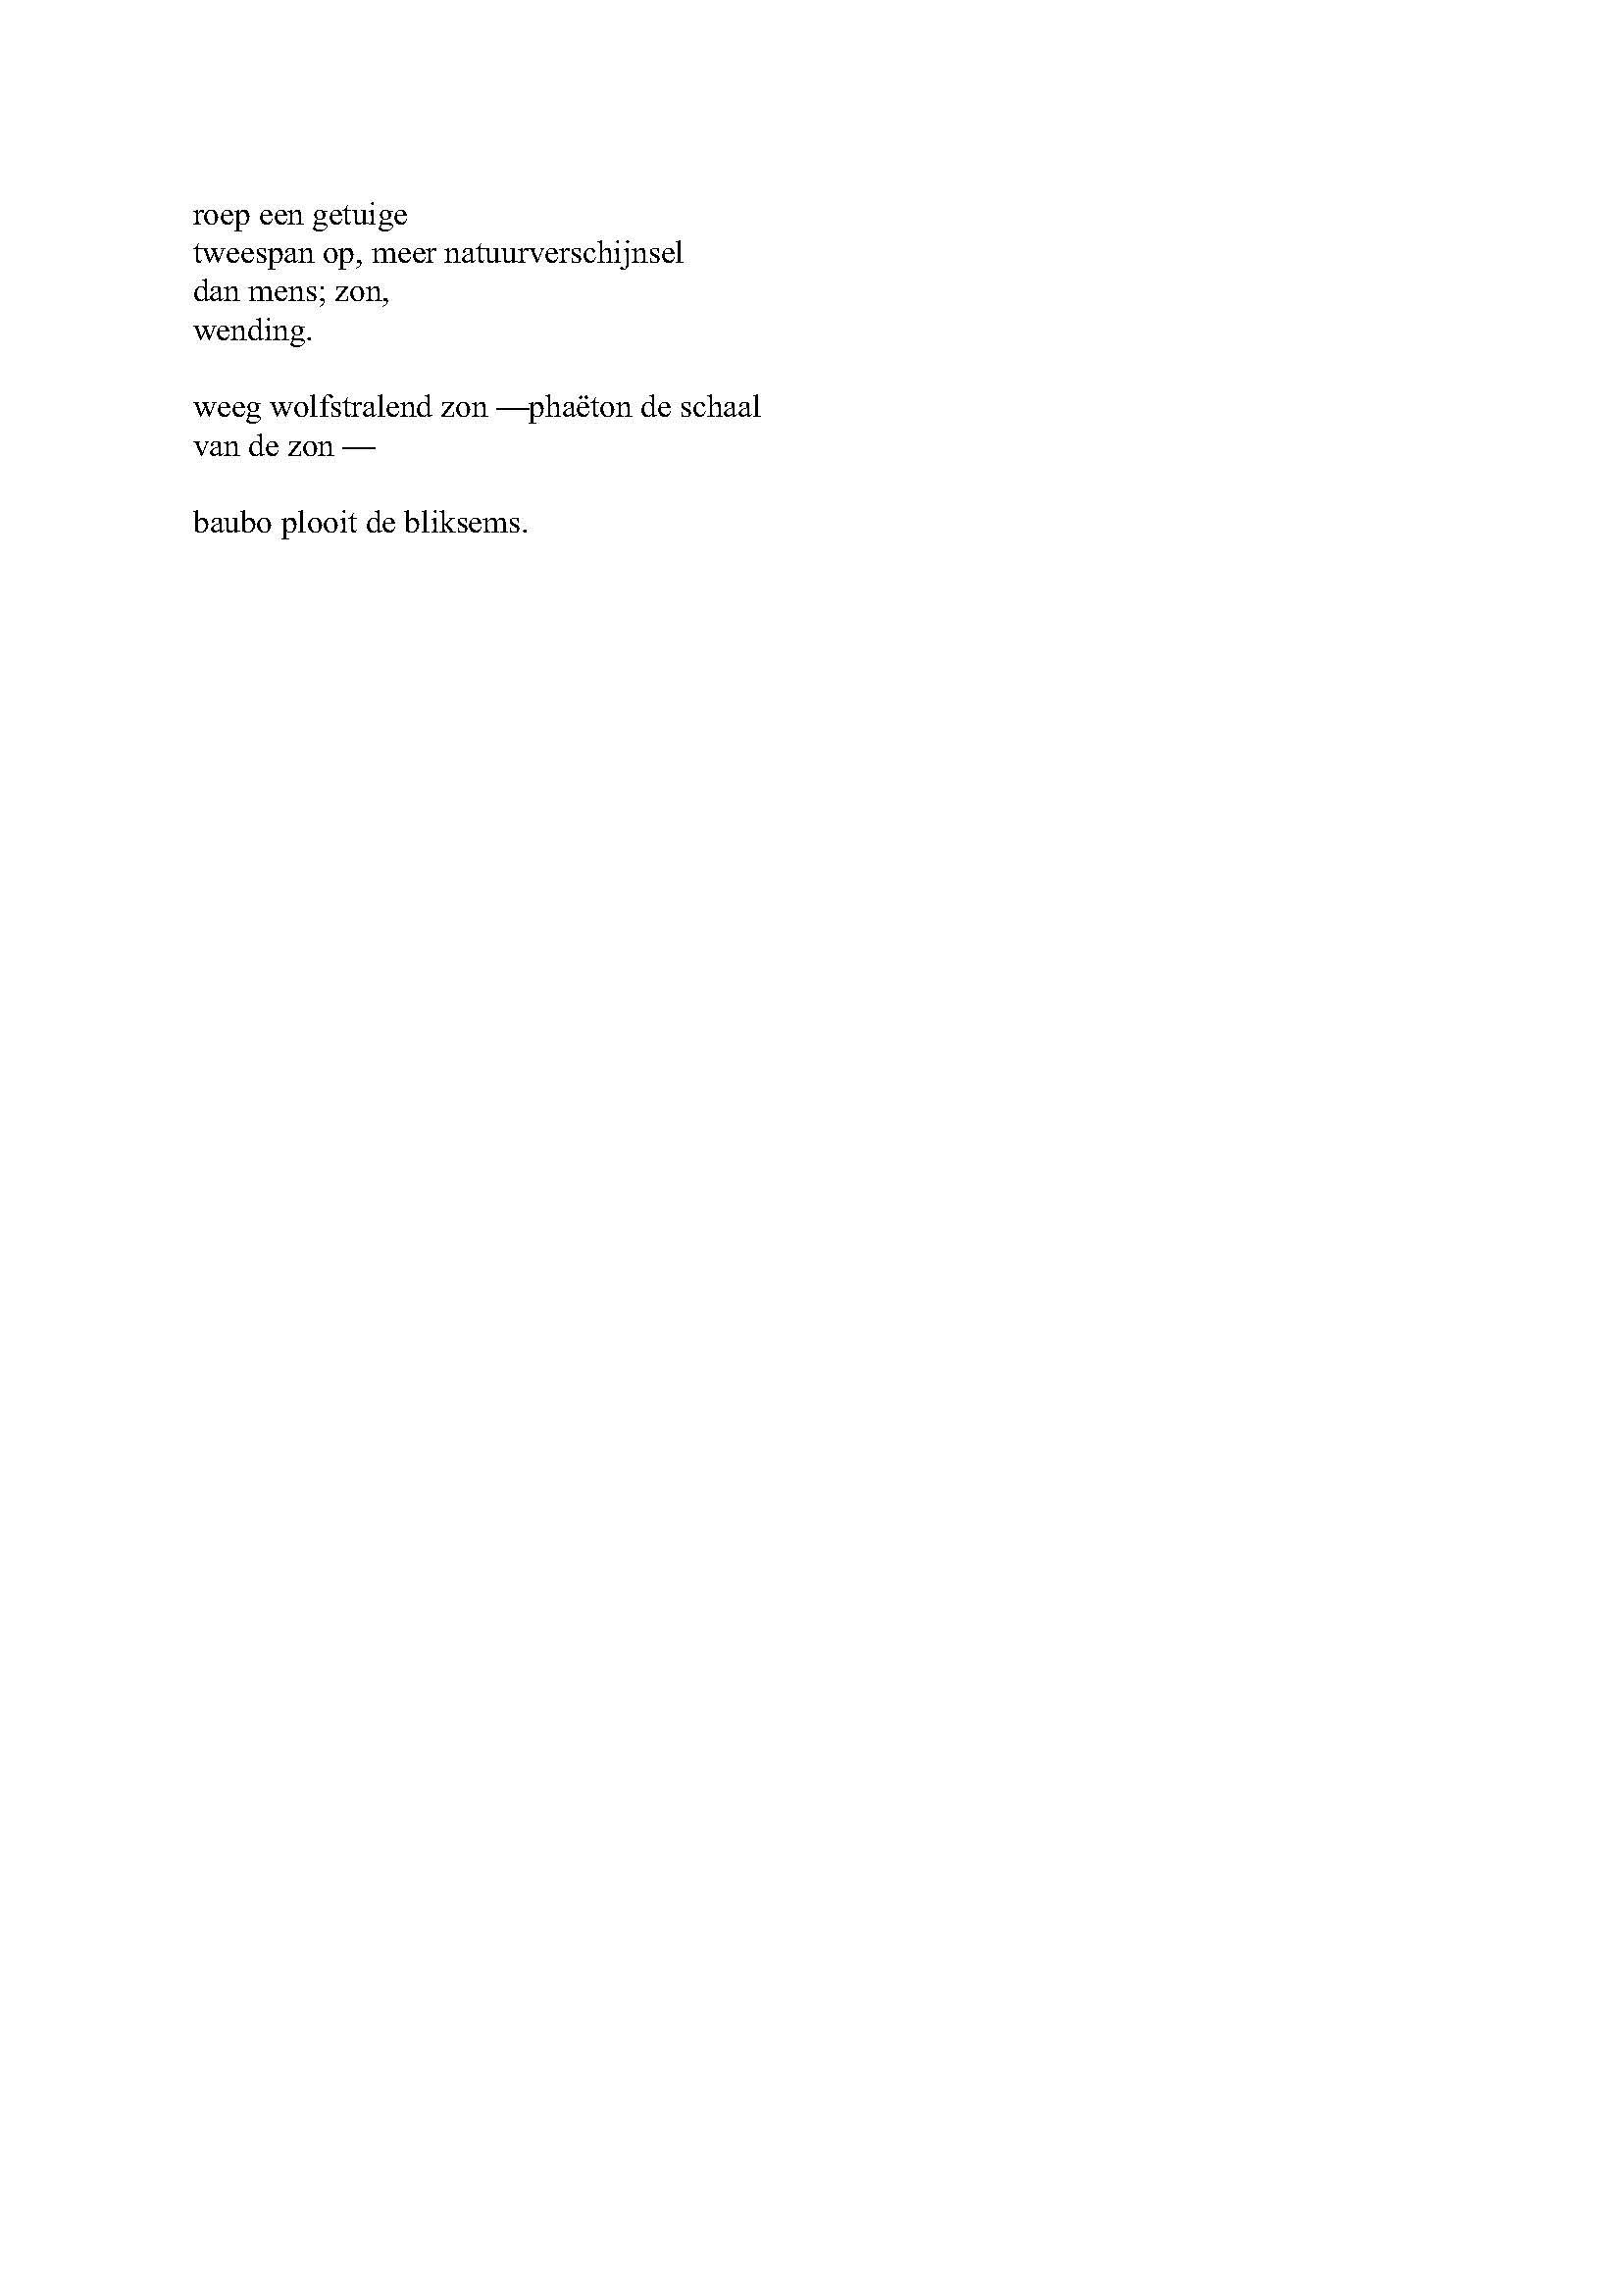 de grote middag - binnenwerk pagina 12